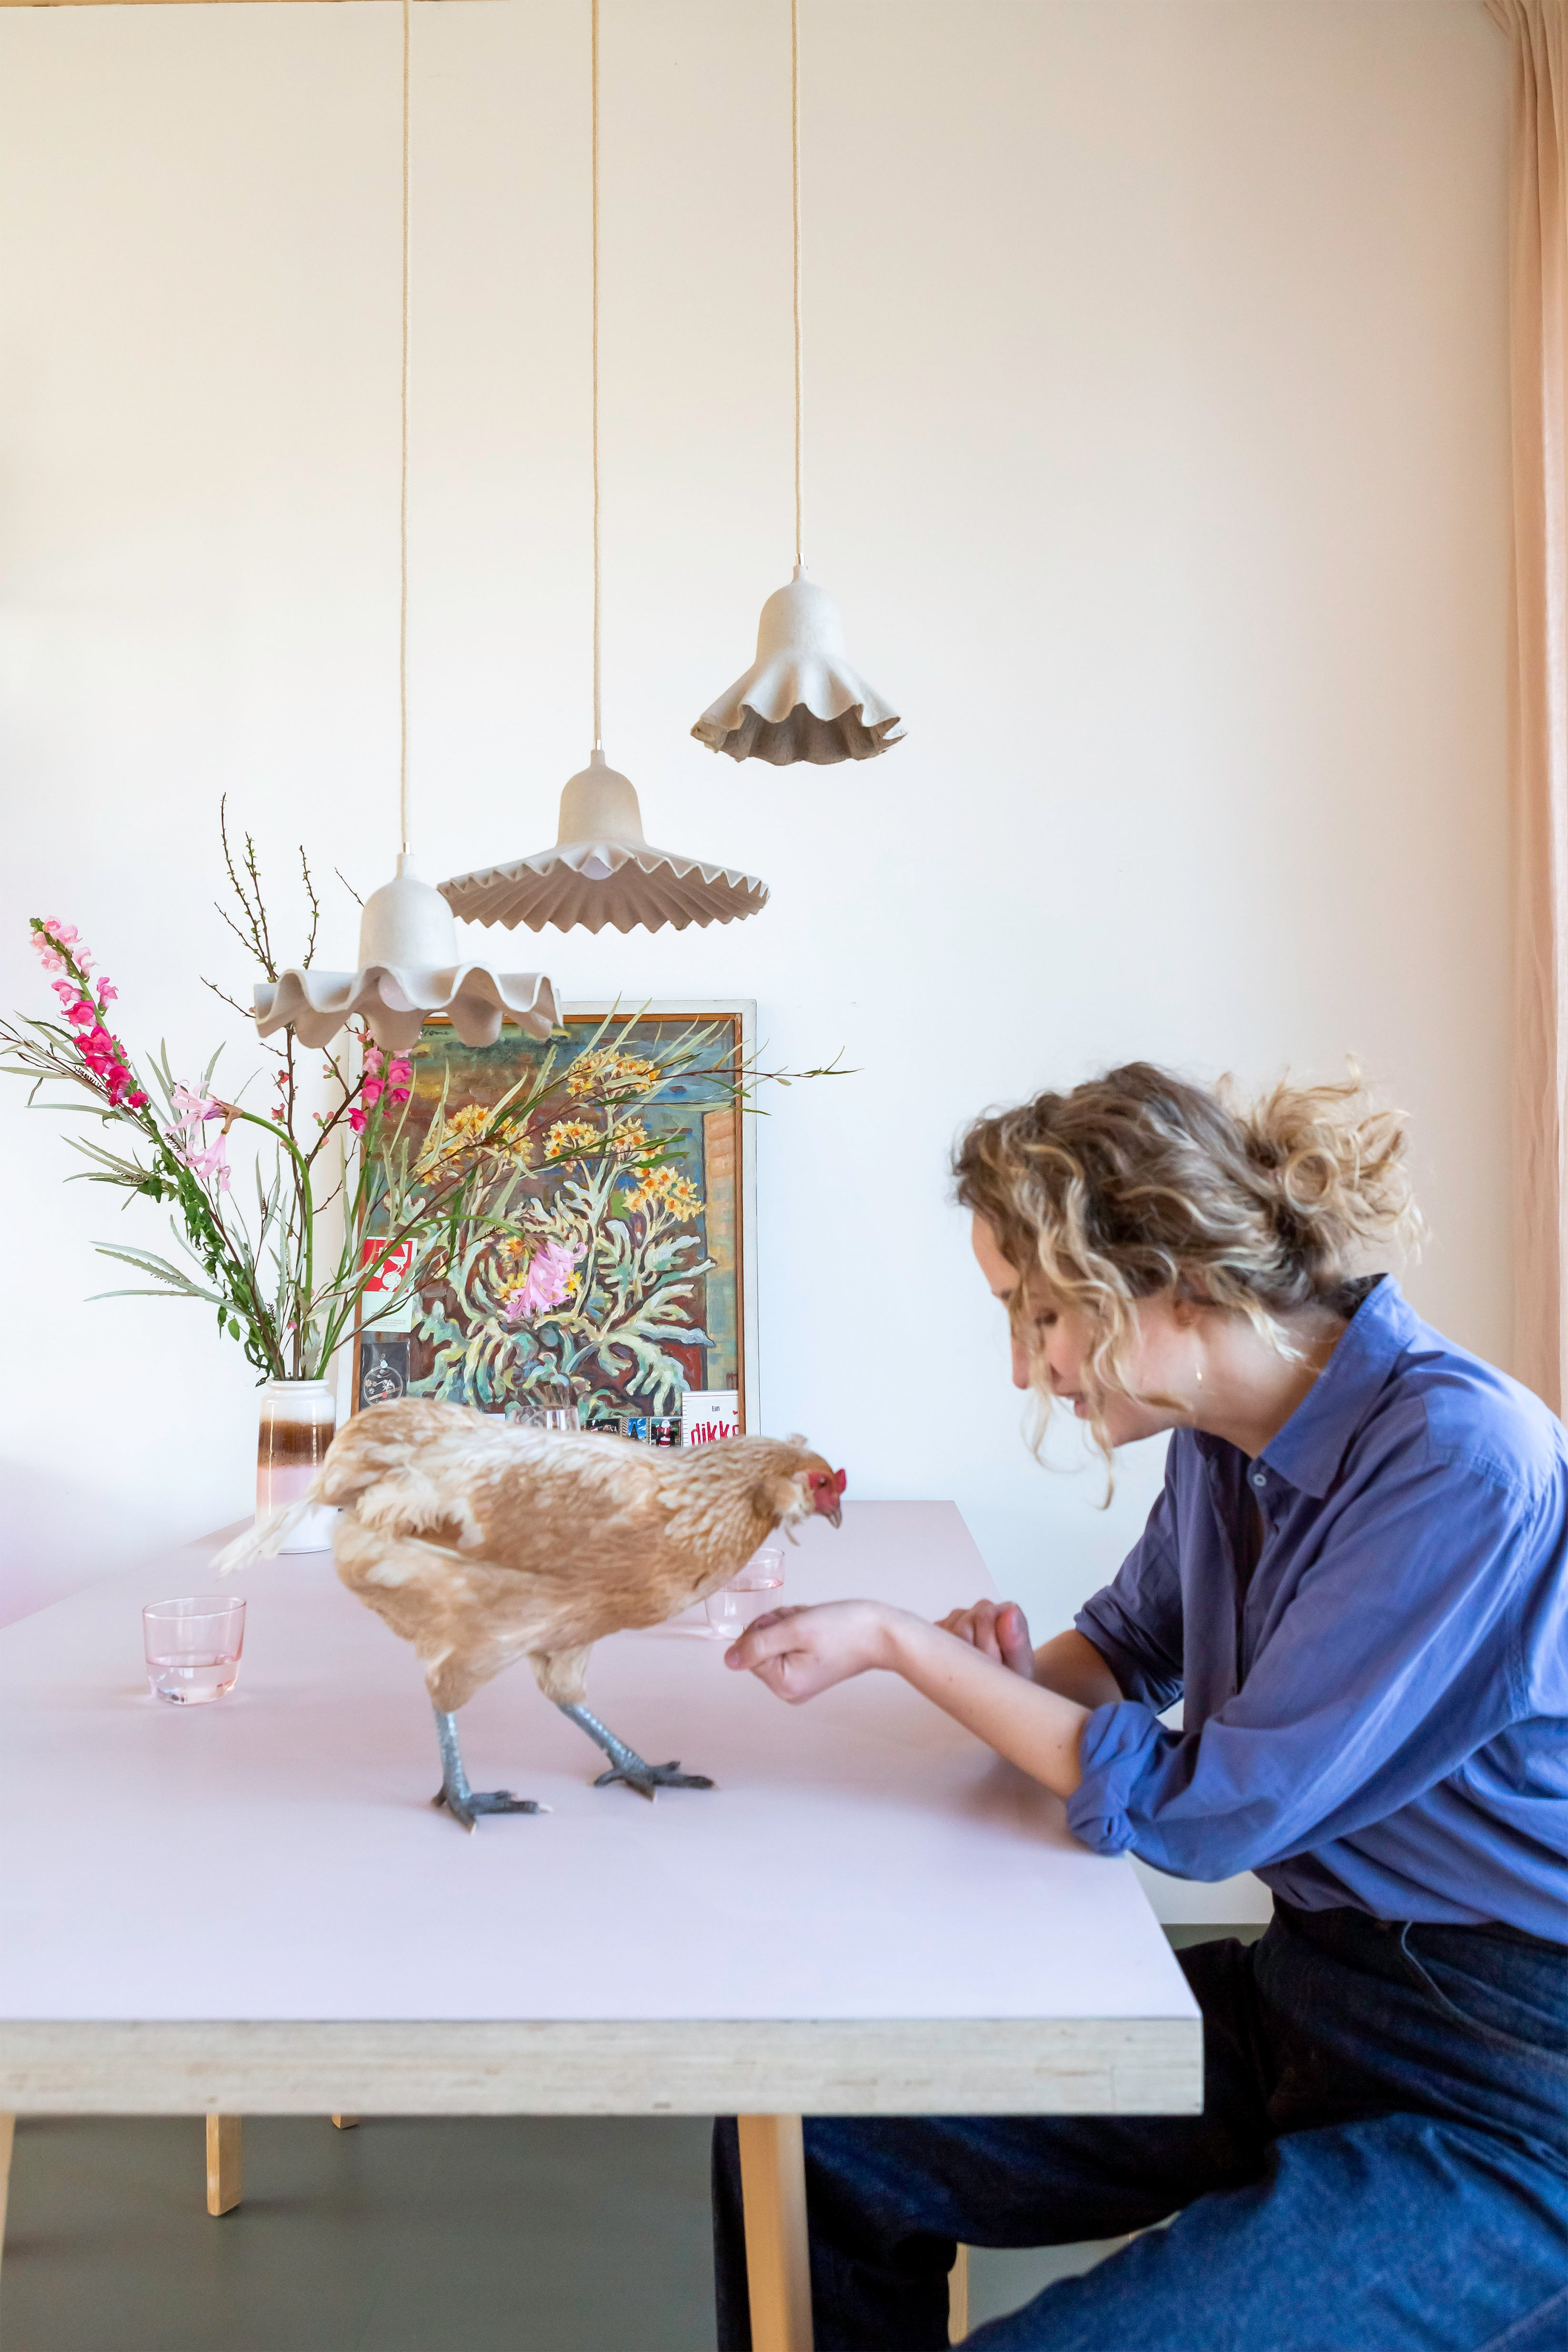 Foekje Fleur with her pet chicken